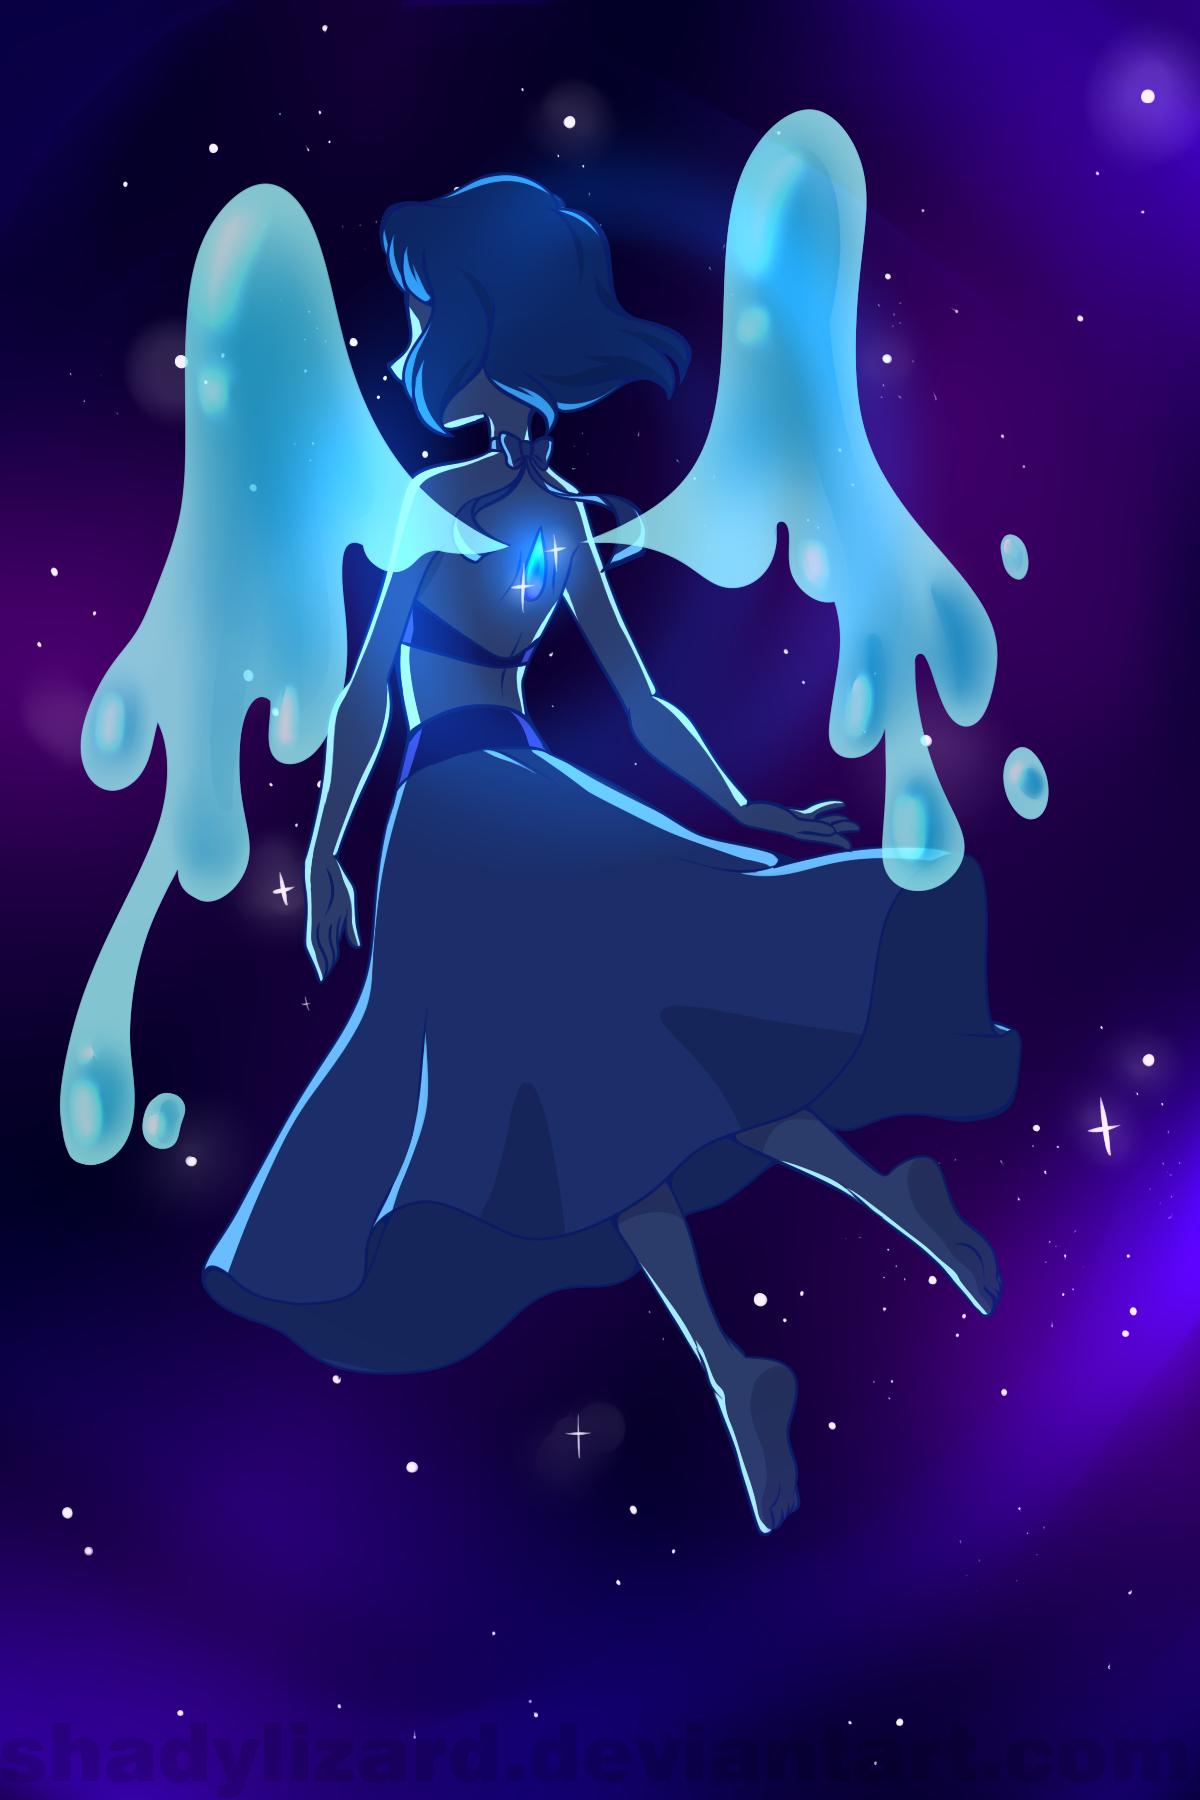 steven universe lapis lazuli by saccharinerose on